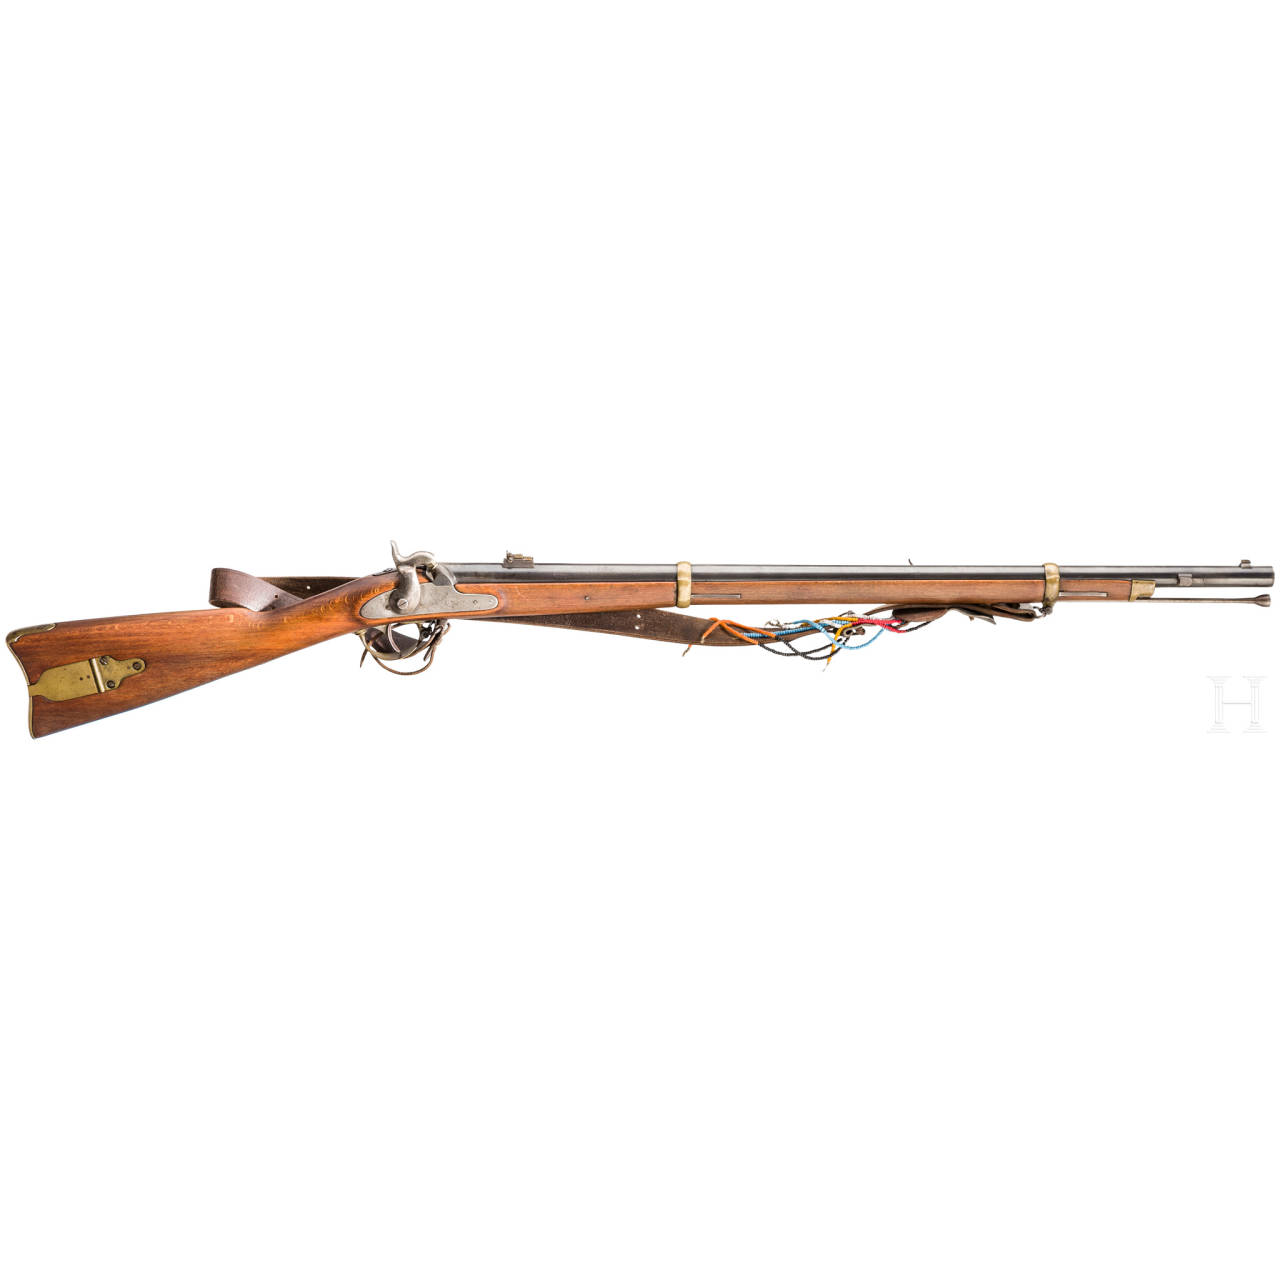 Zouave Rifle, italienische Replika von Antonio Zoli